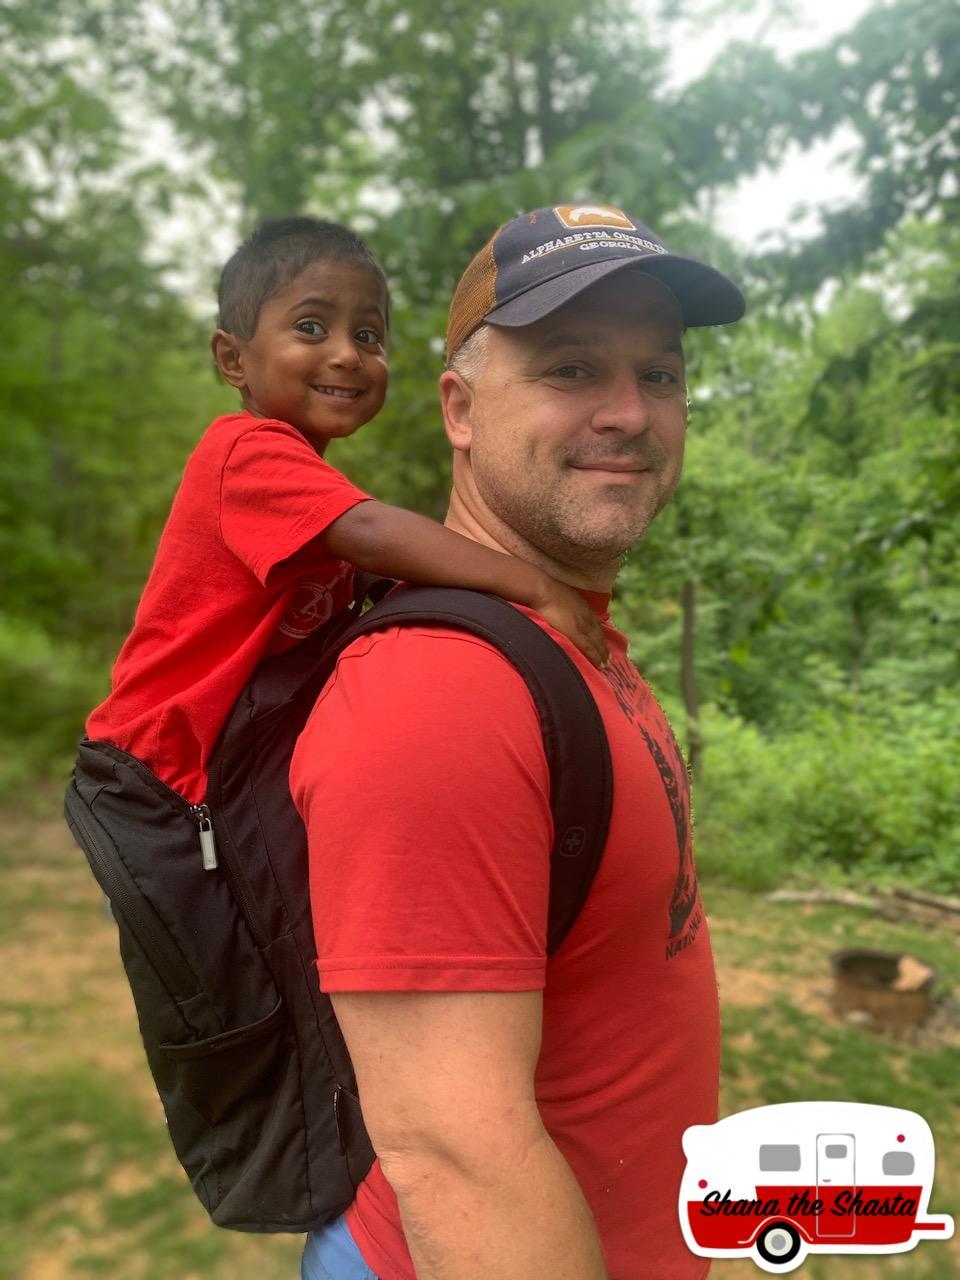 Improvised-Hiking-Backpack-Carrier